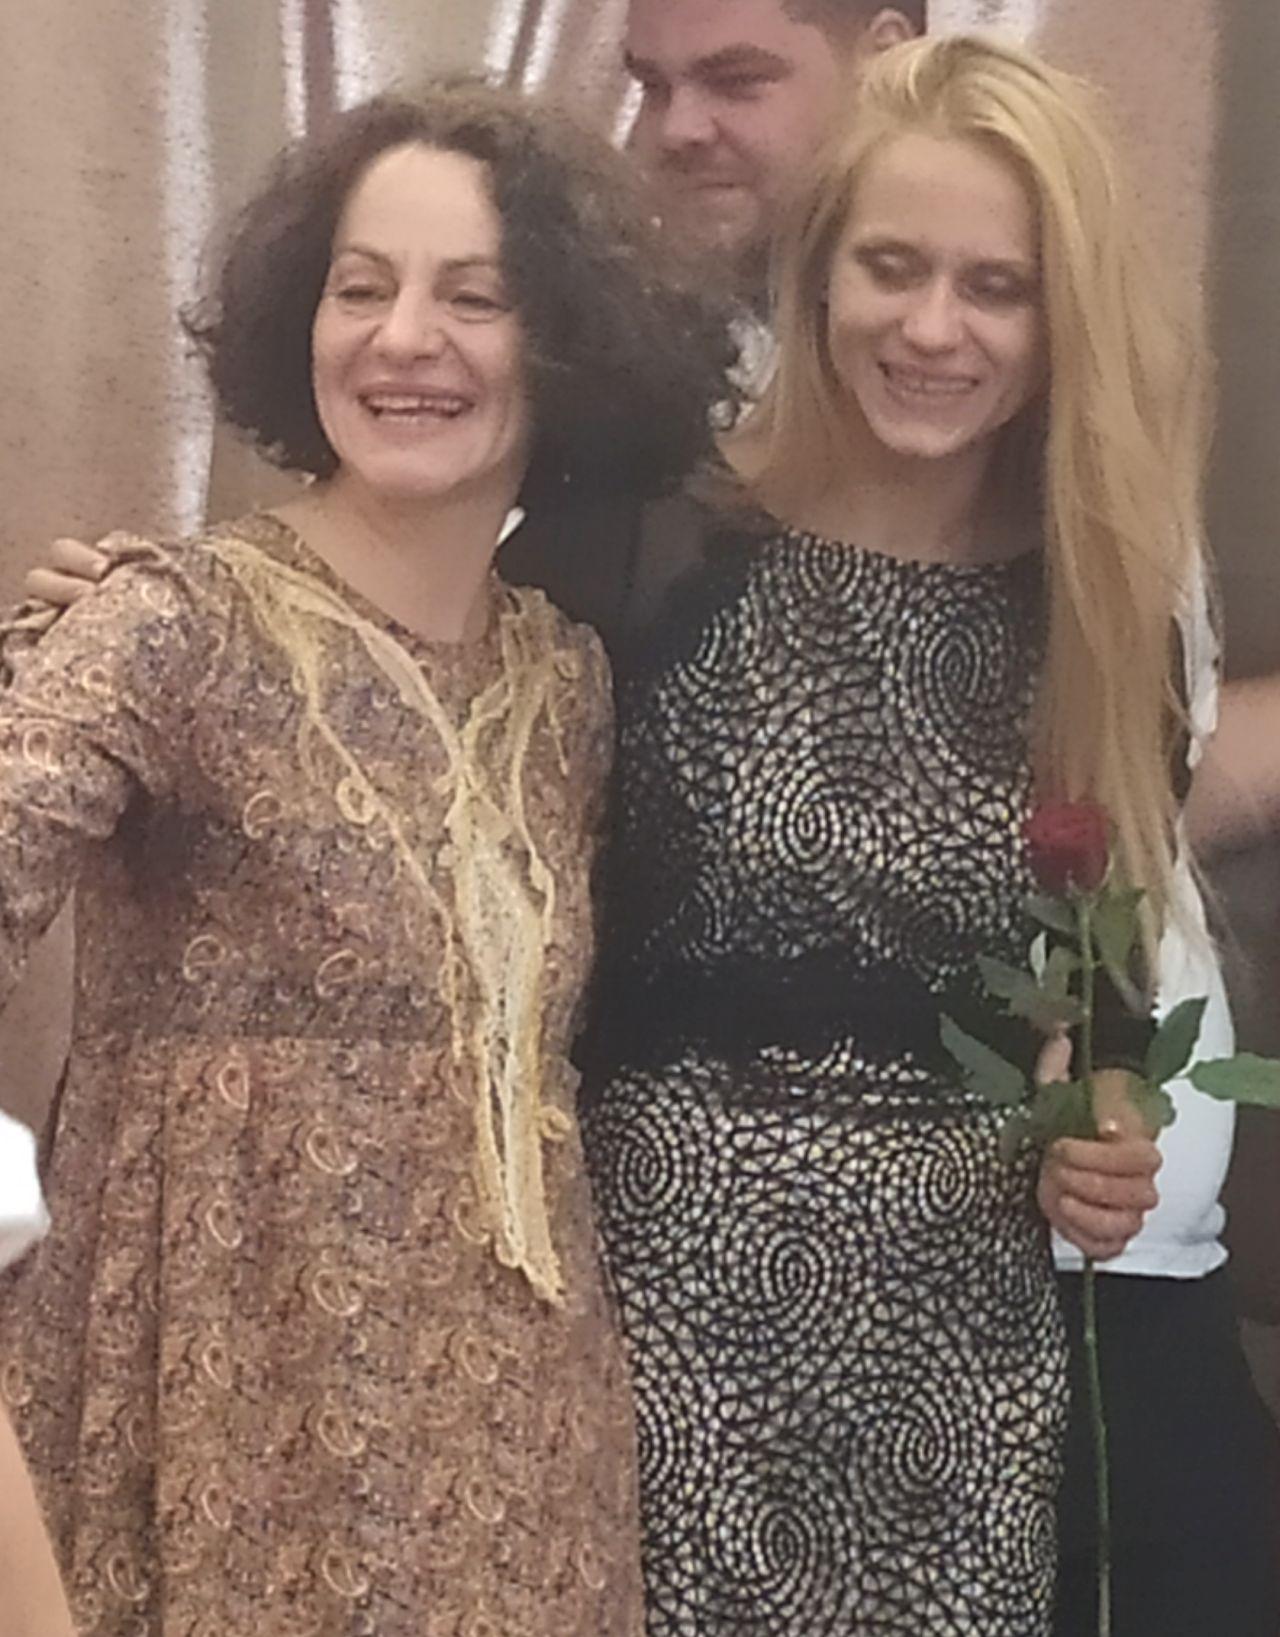 Interview of Malgozhata Spila with Bistra Pisancheva